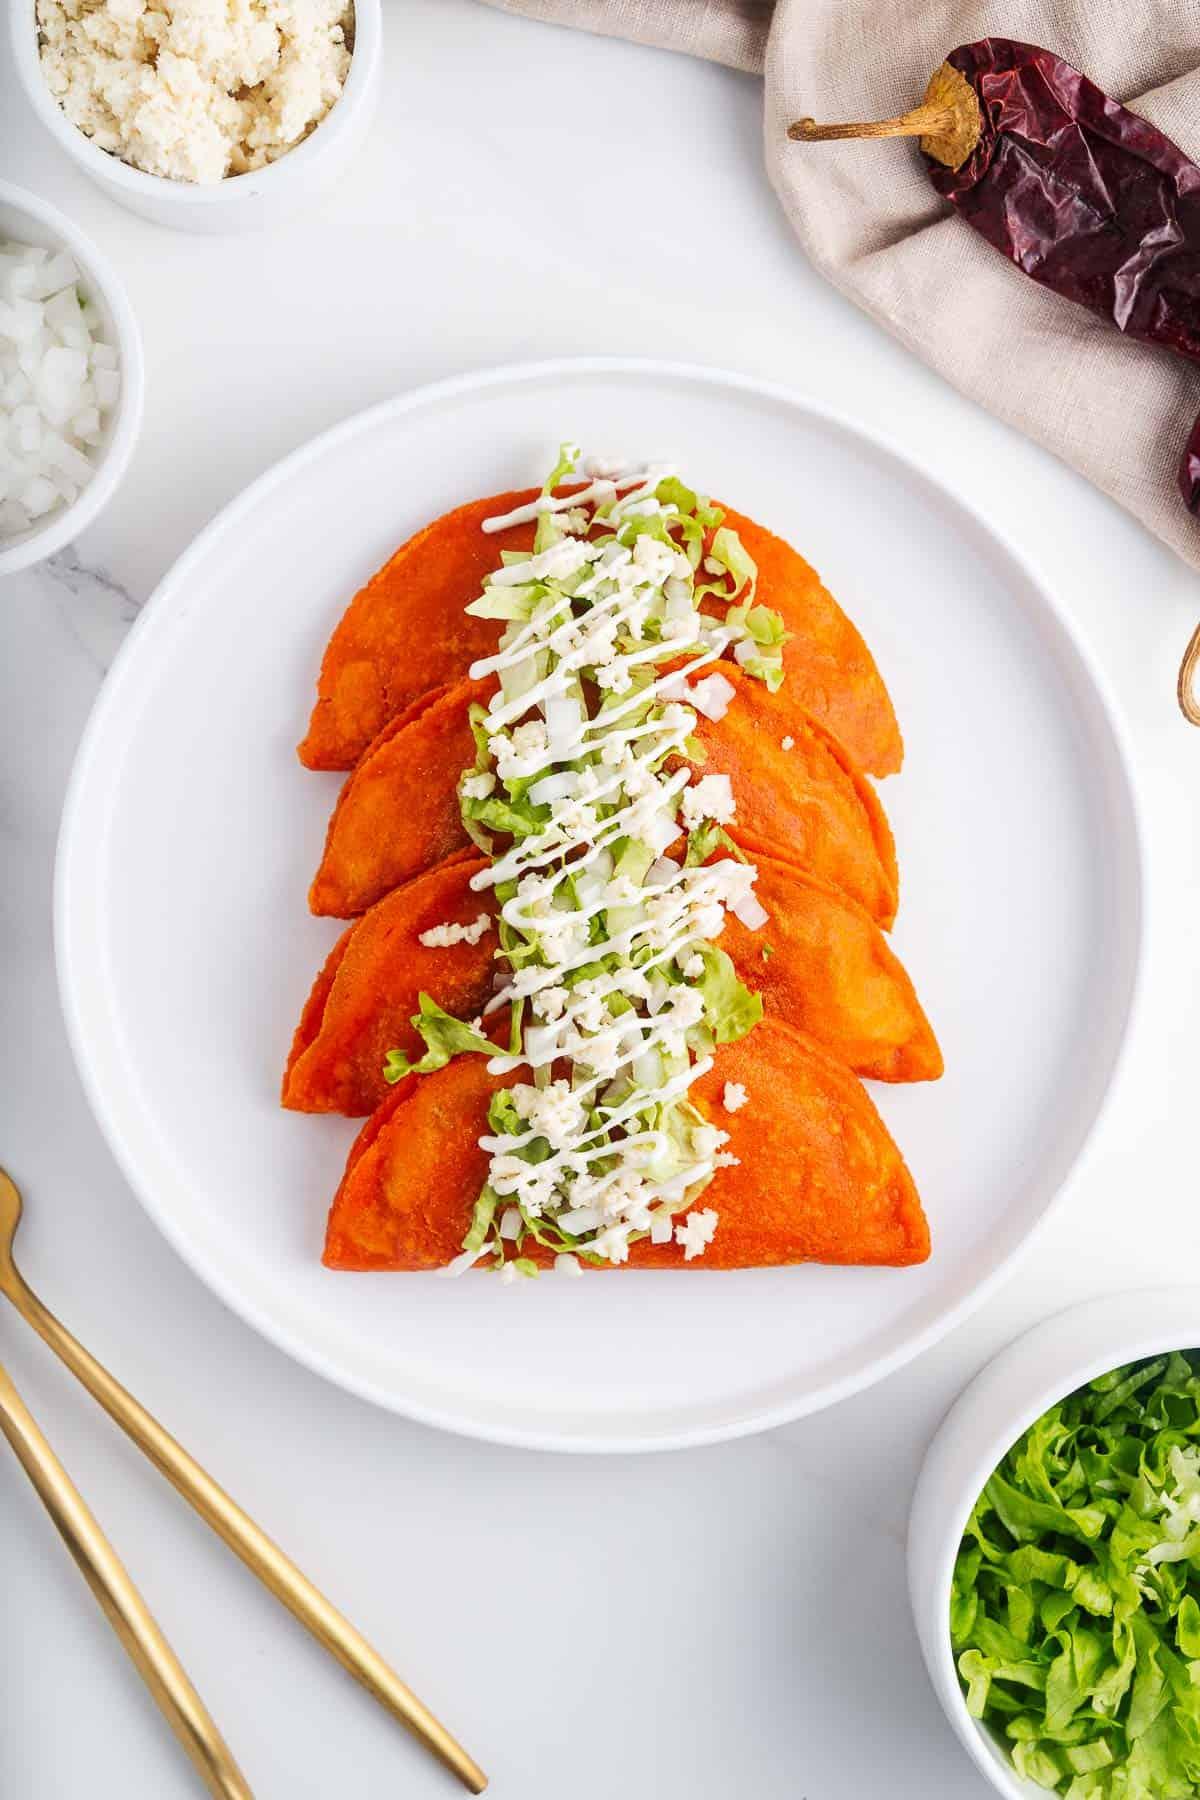 Enchiladas Potosinas on a Plate With Garnishes